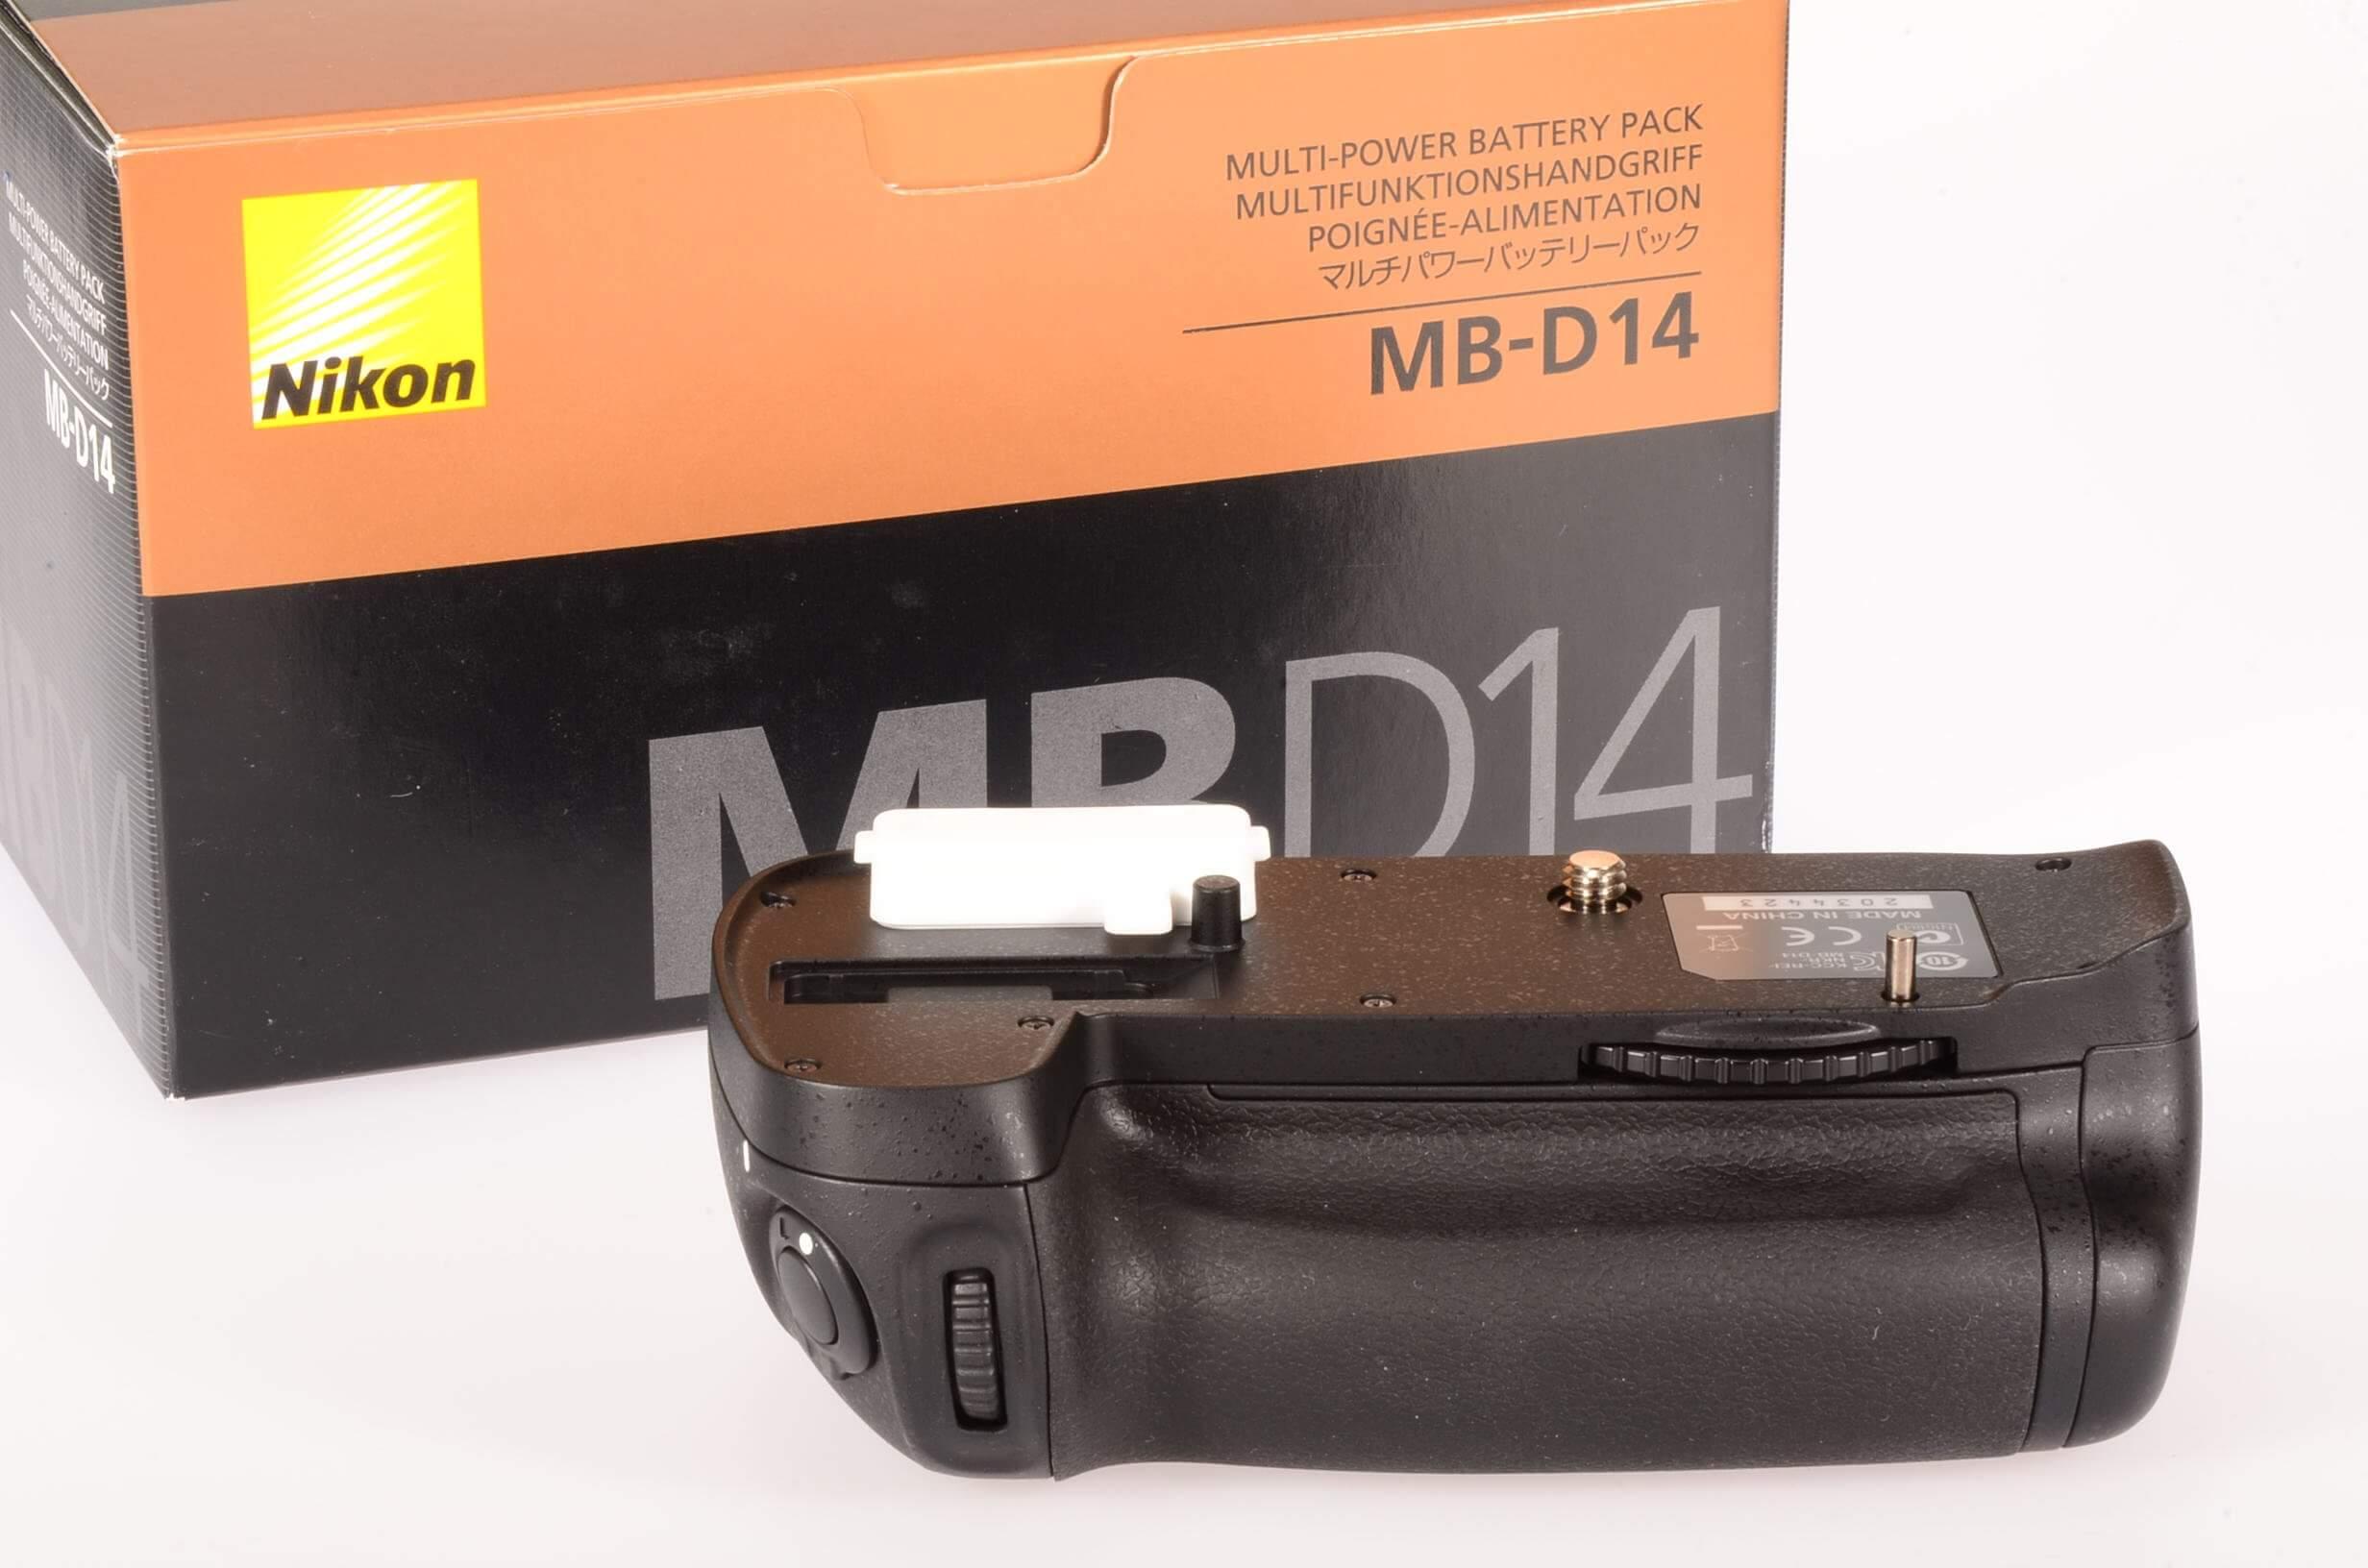 Nikon MB-D14 multi-power battery pack, unused!